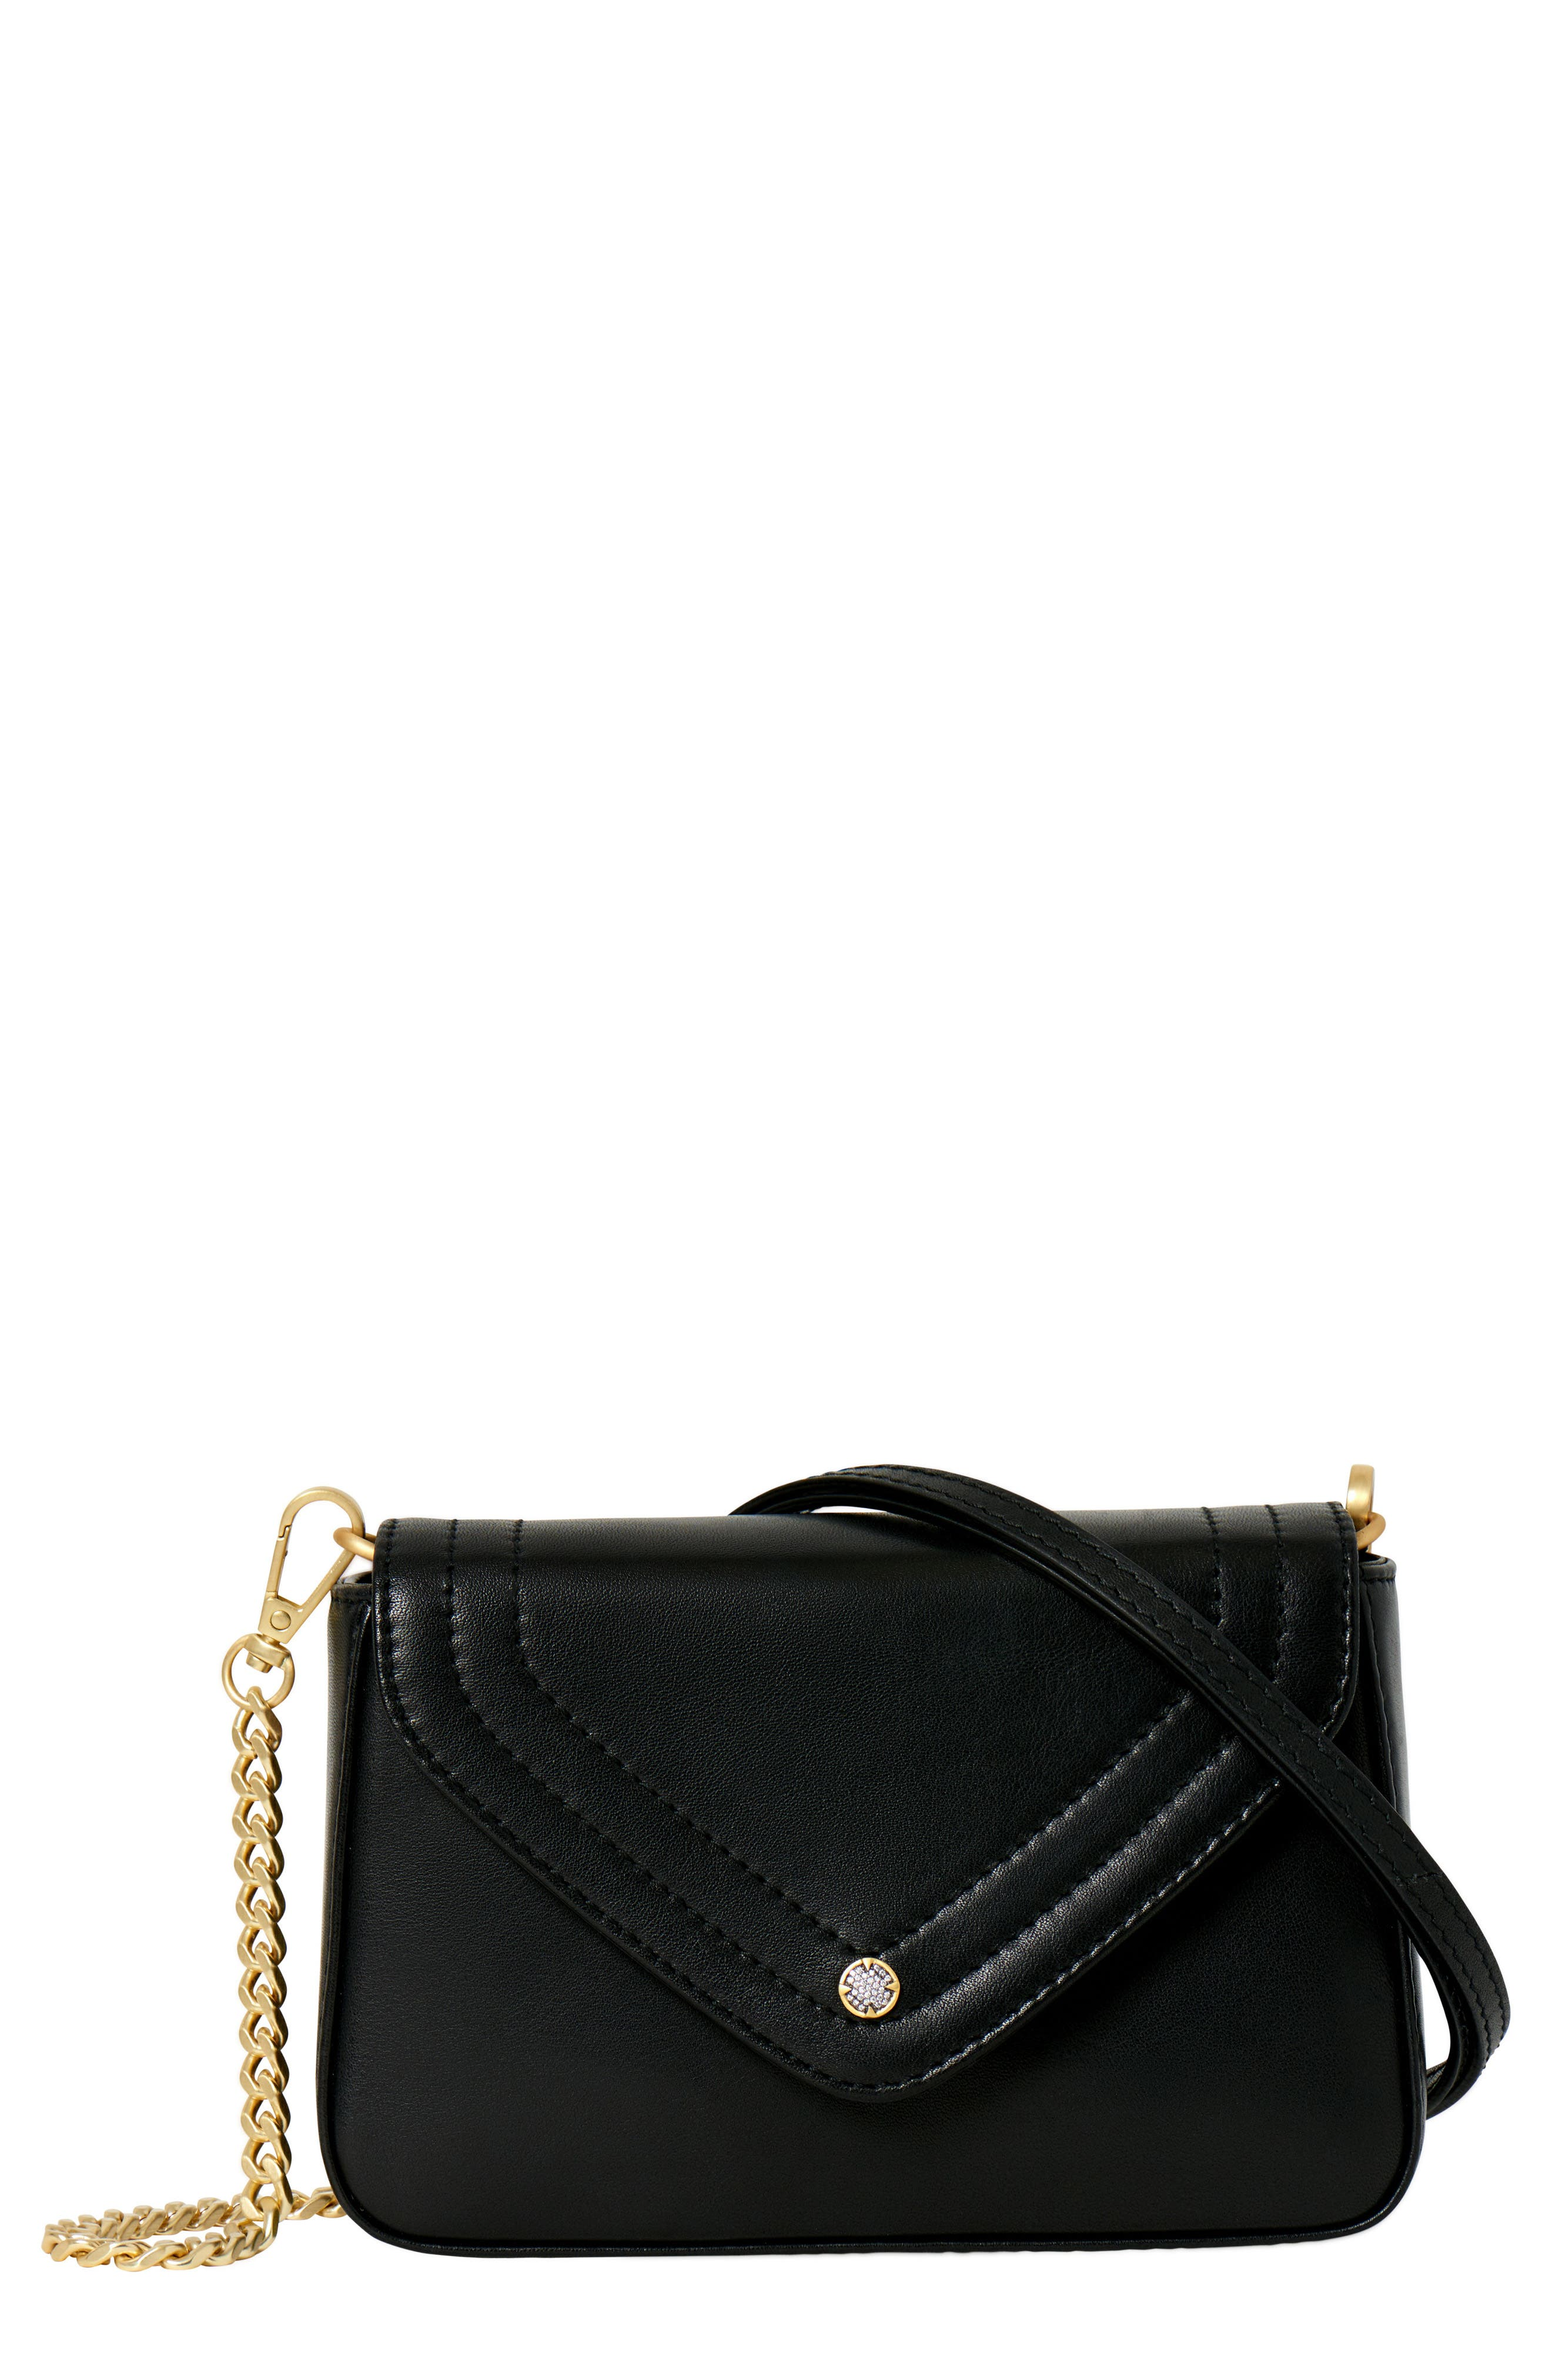 Maiden Leather Crossbody Bag,                             Main thumbnail 1, color,                             BLACK